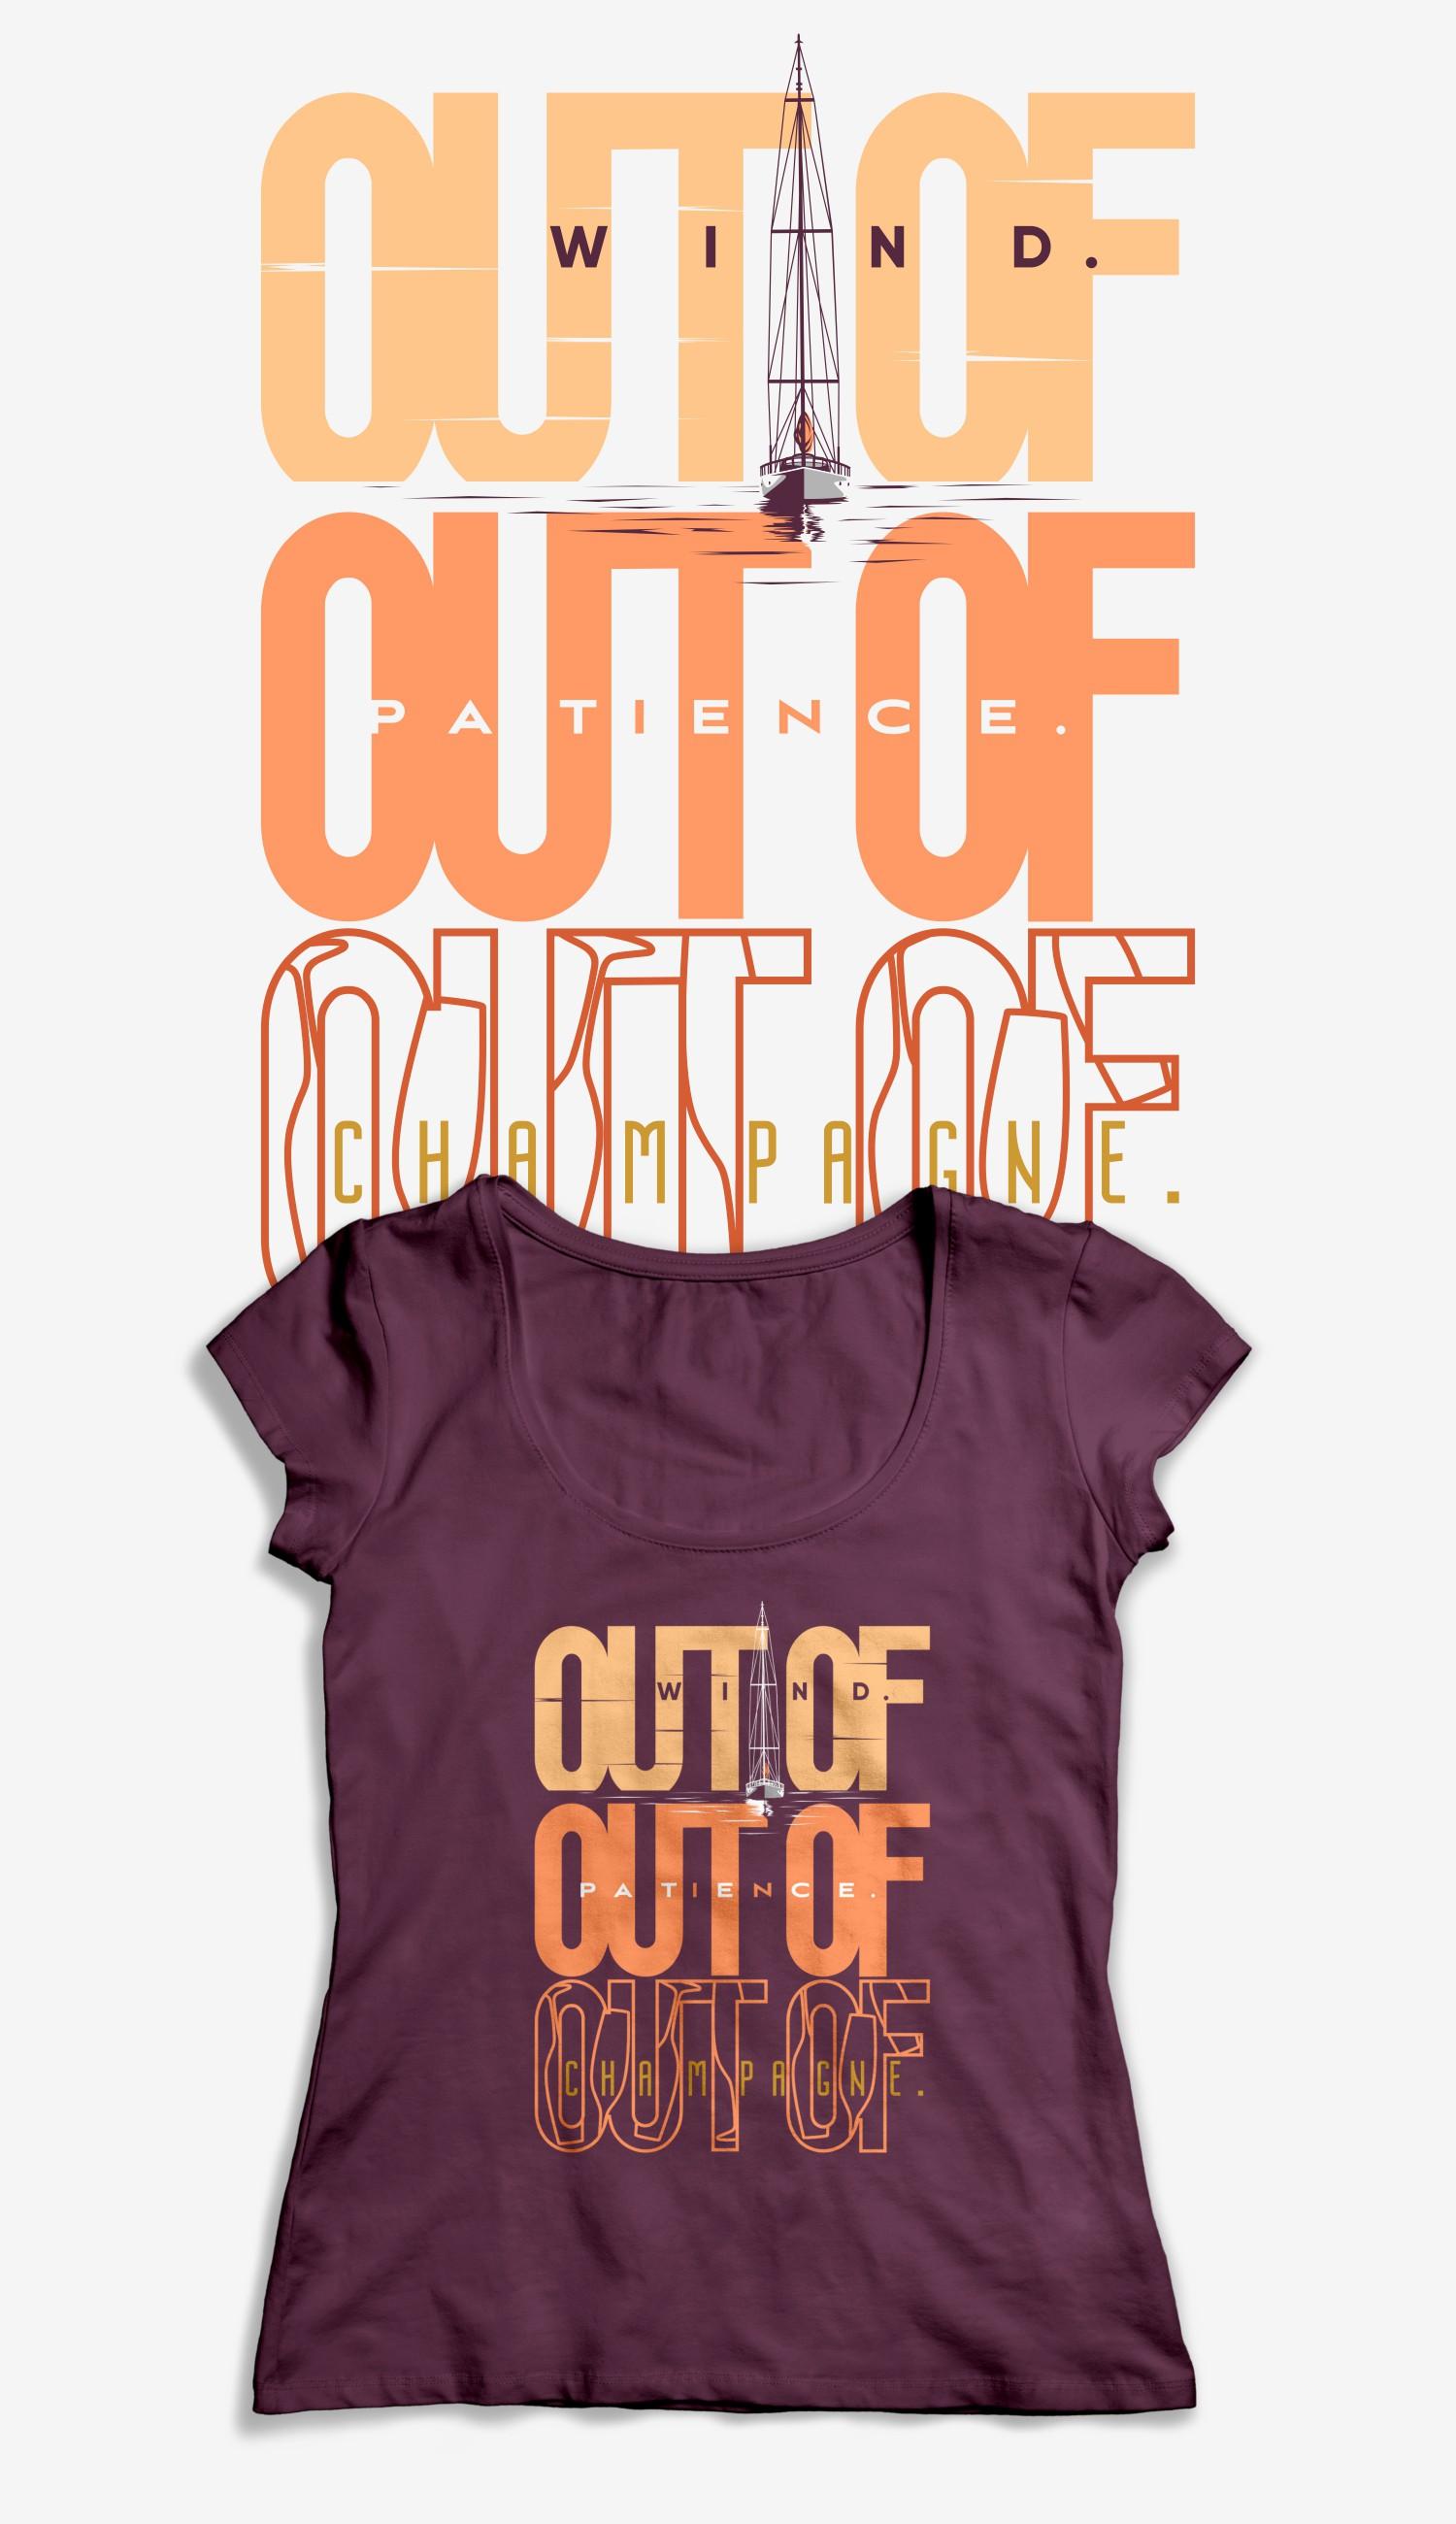 Yachting Clothing Brand T-Shirt 2